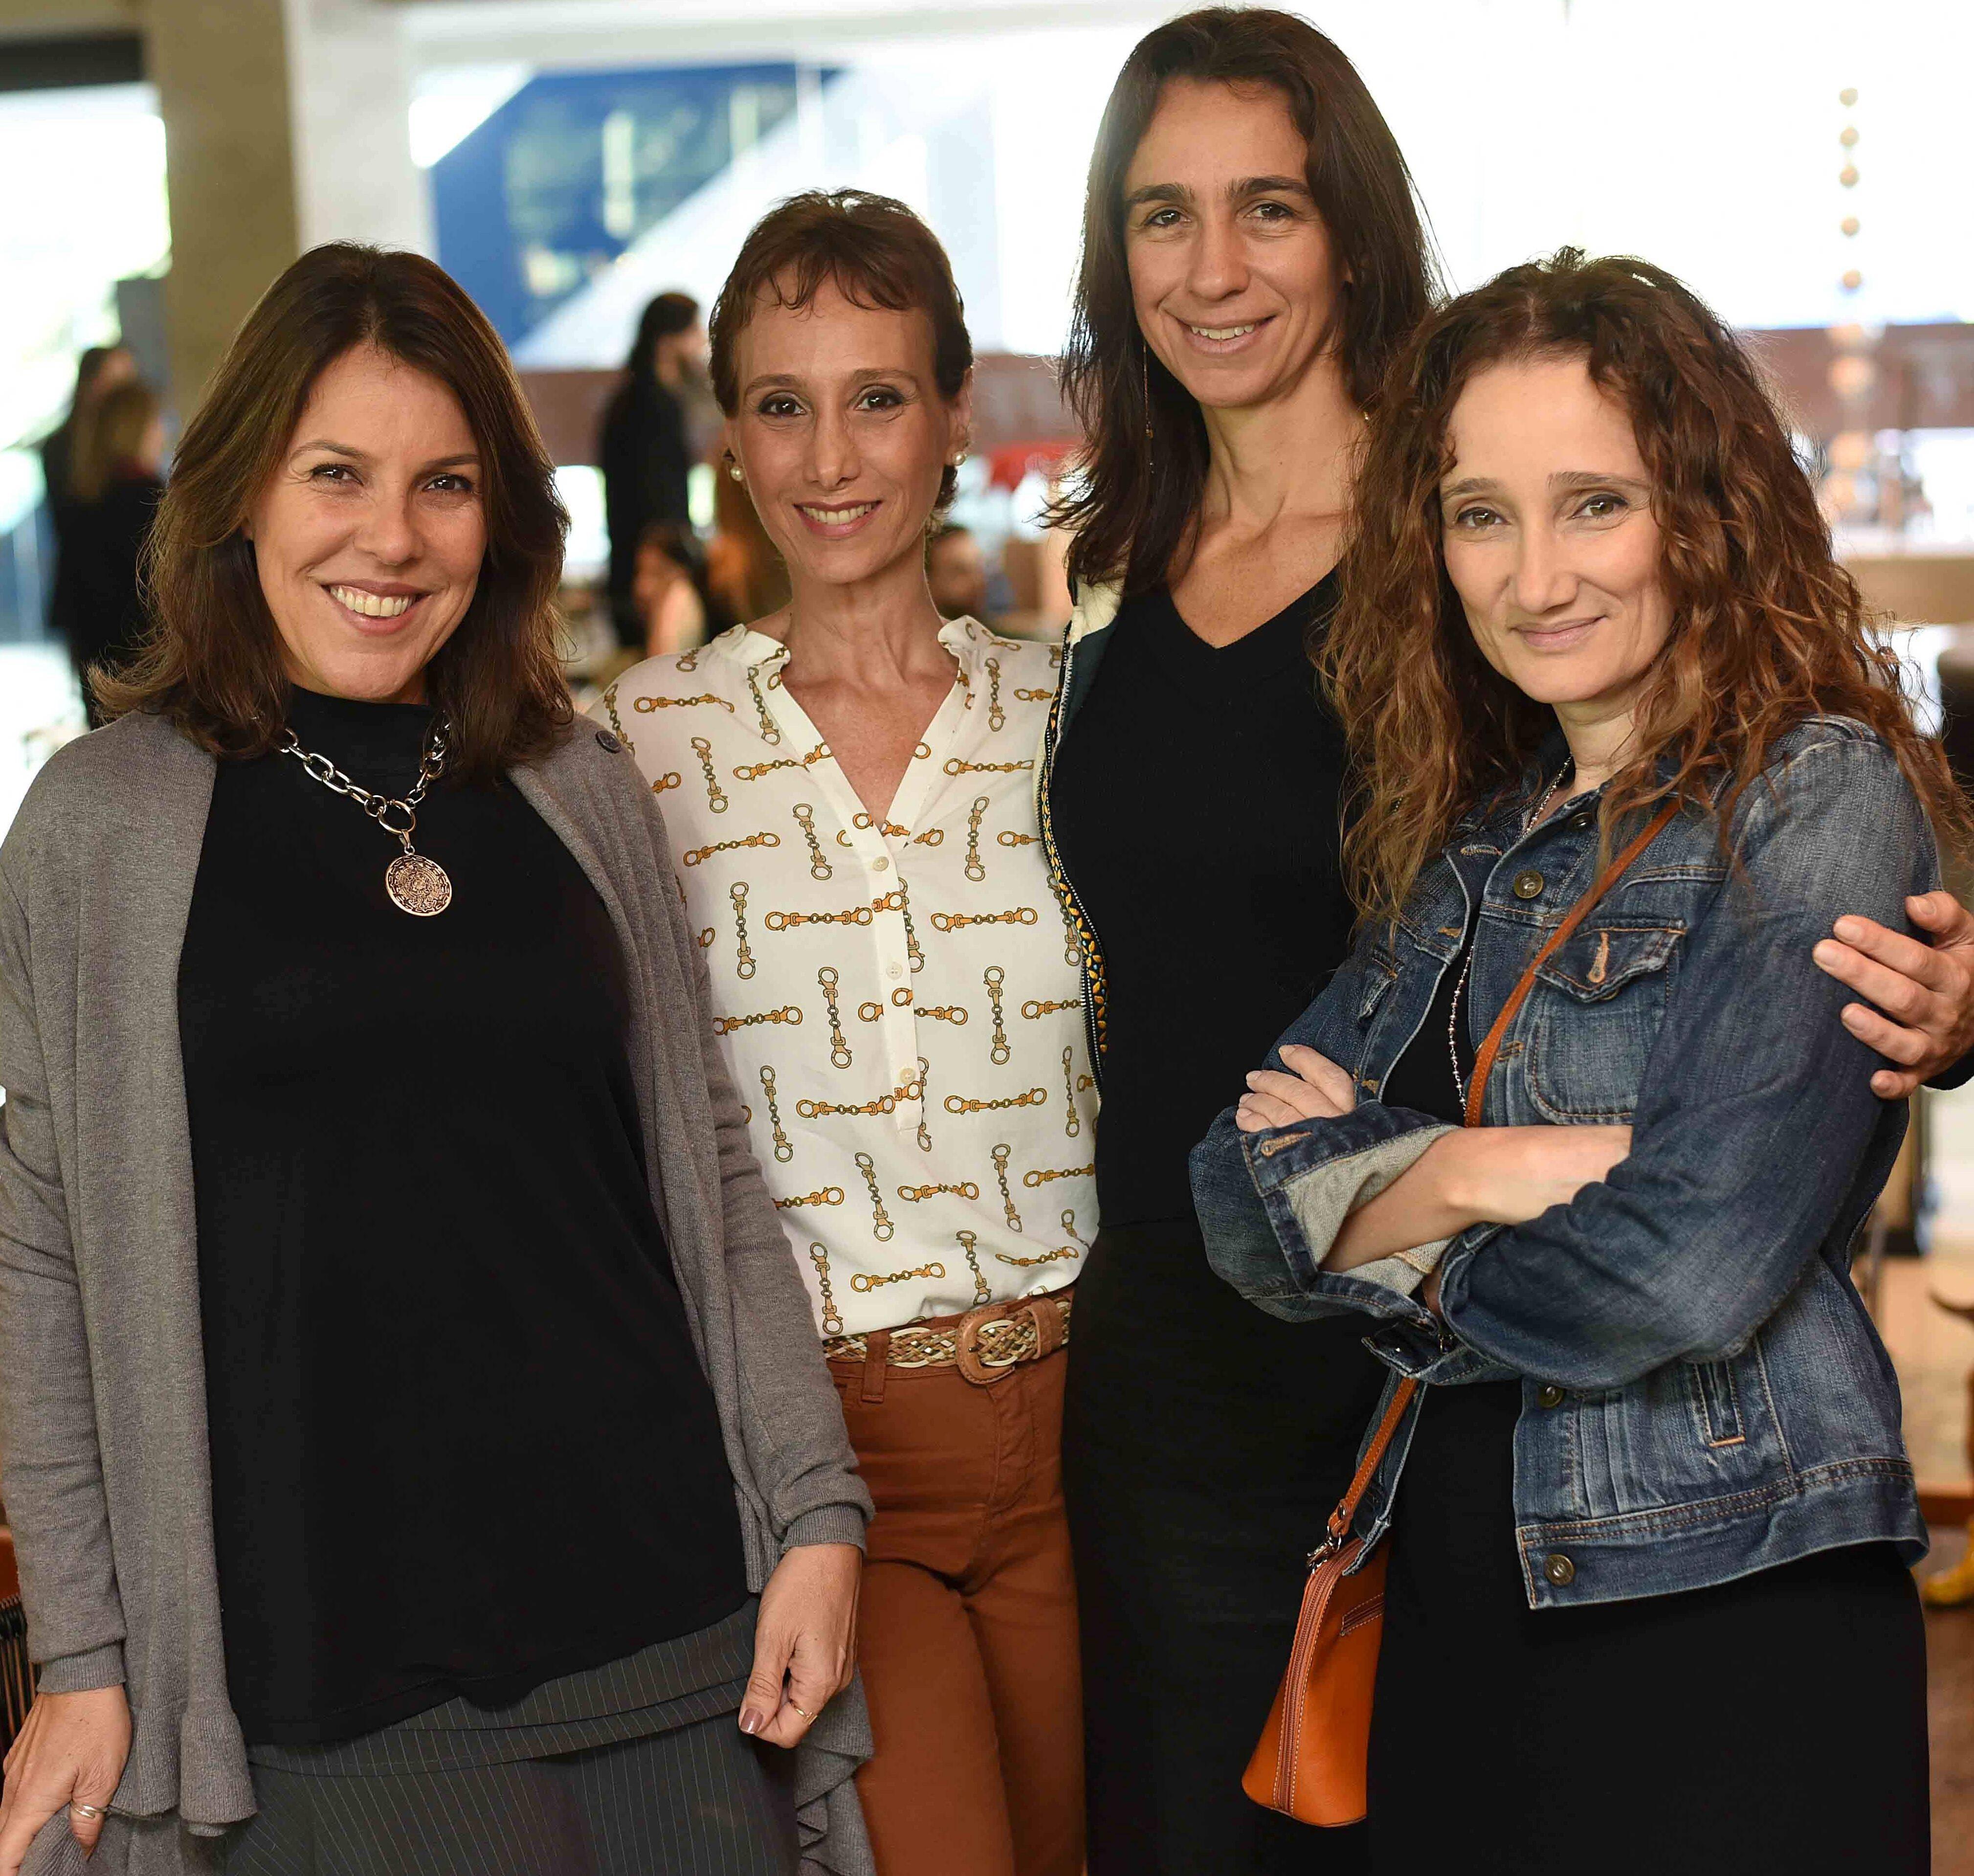 Andrea Neves Duarte, Luciana Nasajon, Mabel Graham e Andrea Menezes  / Foto: Ari Kaye